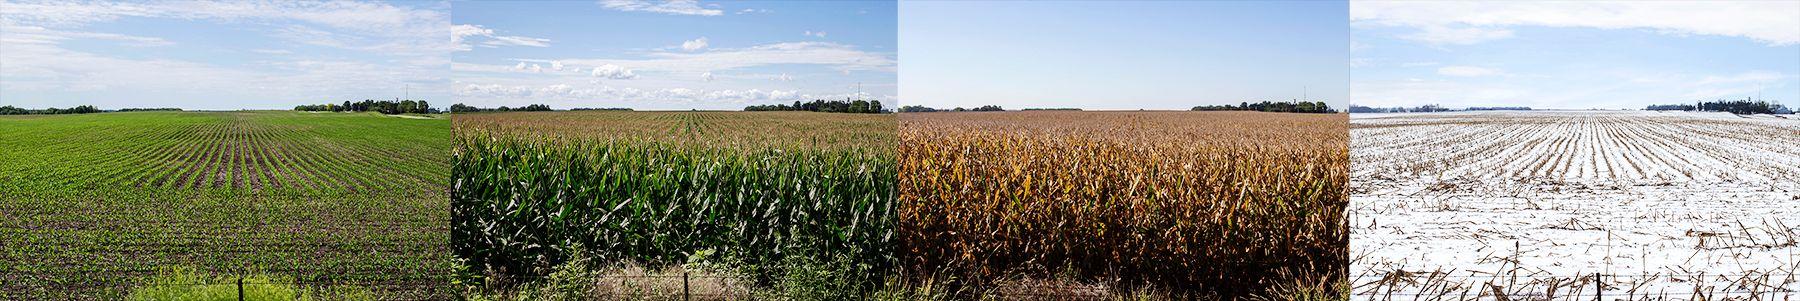 farm1ivebooks.jpg